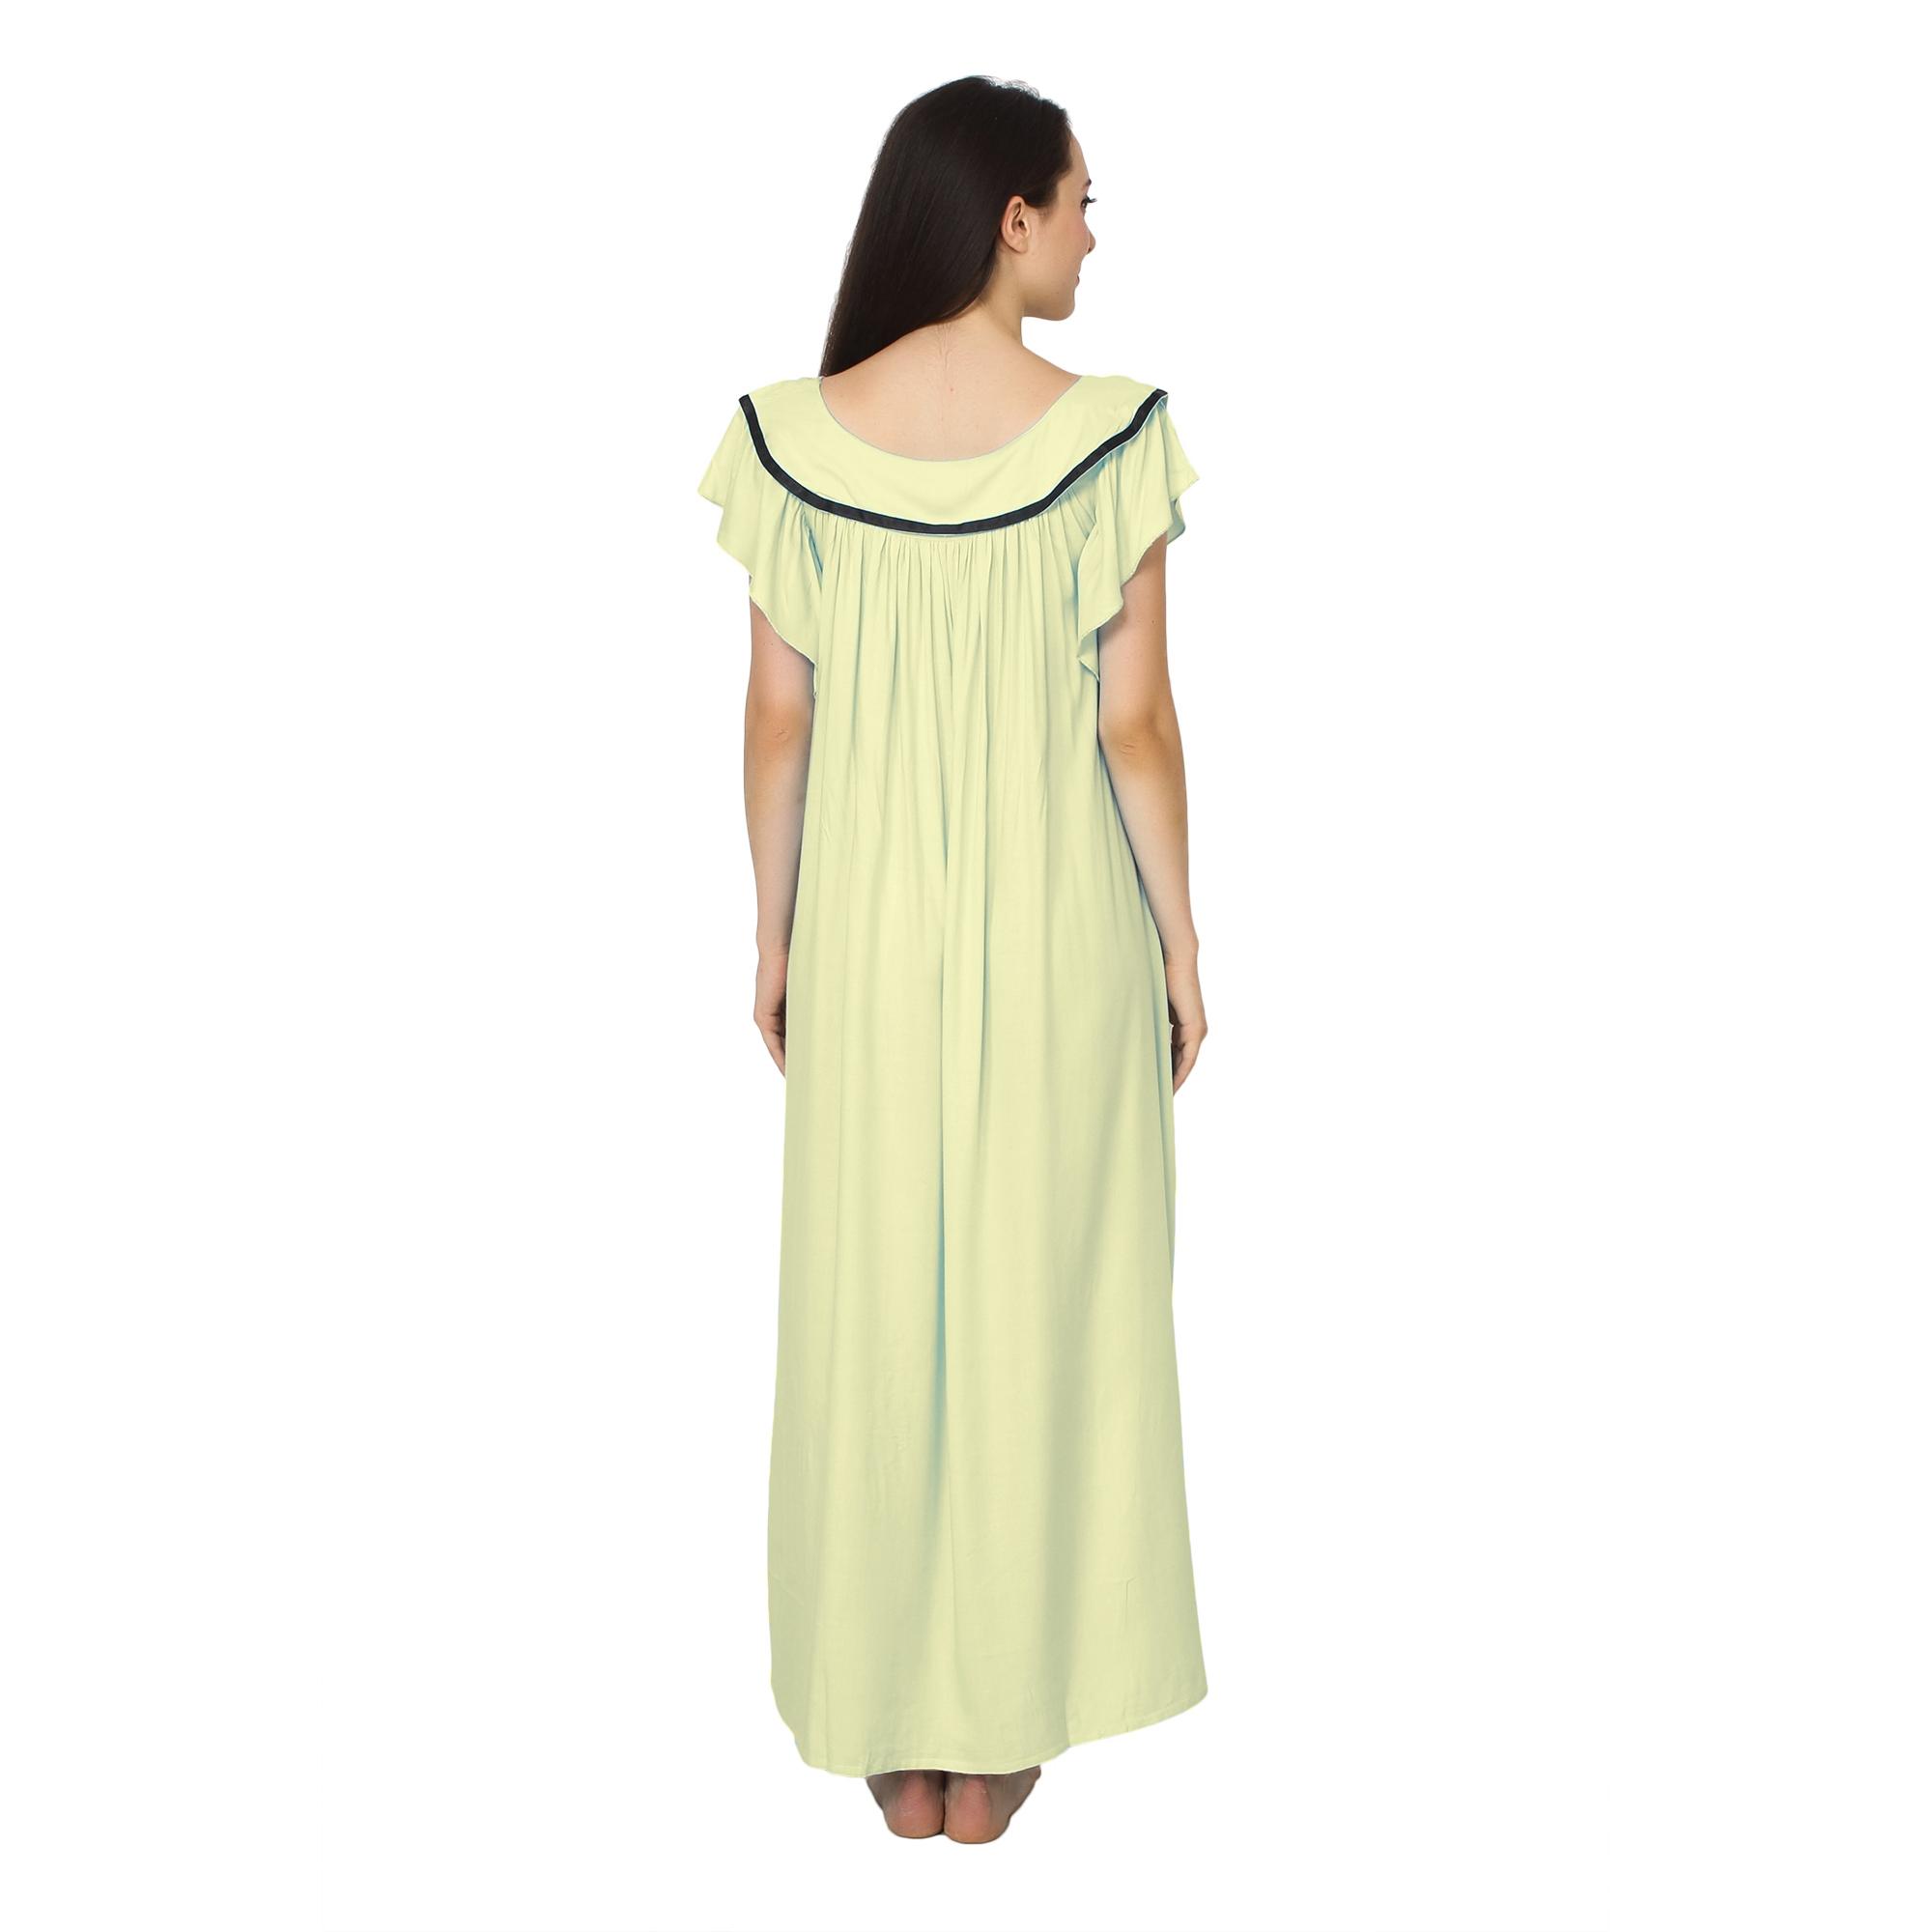 Embellished Neck Raglan Sleeve Maxi Night-Gown Nighty in Cream